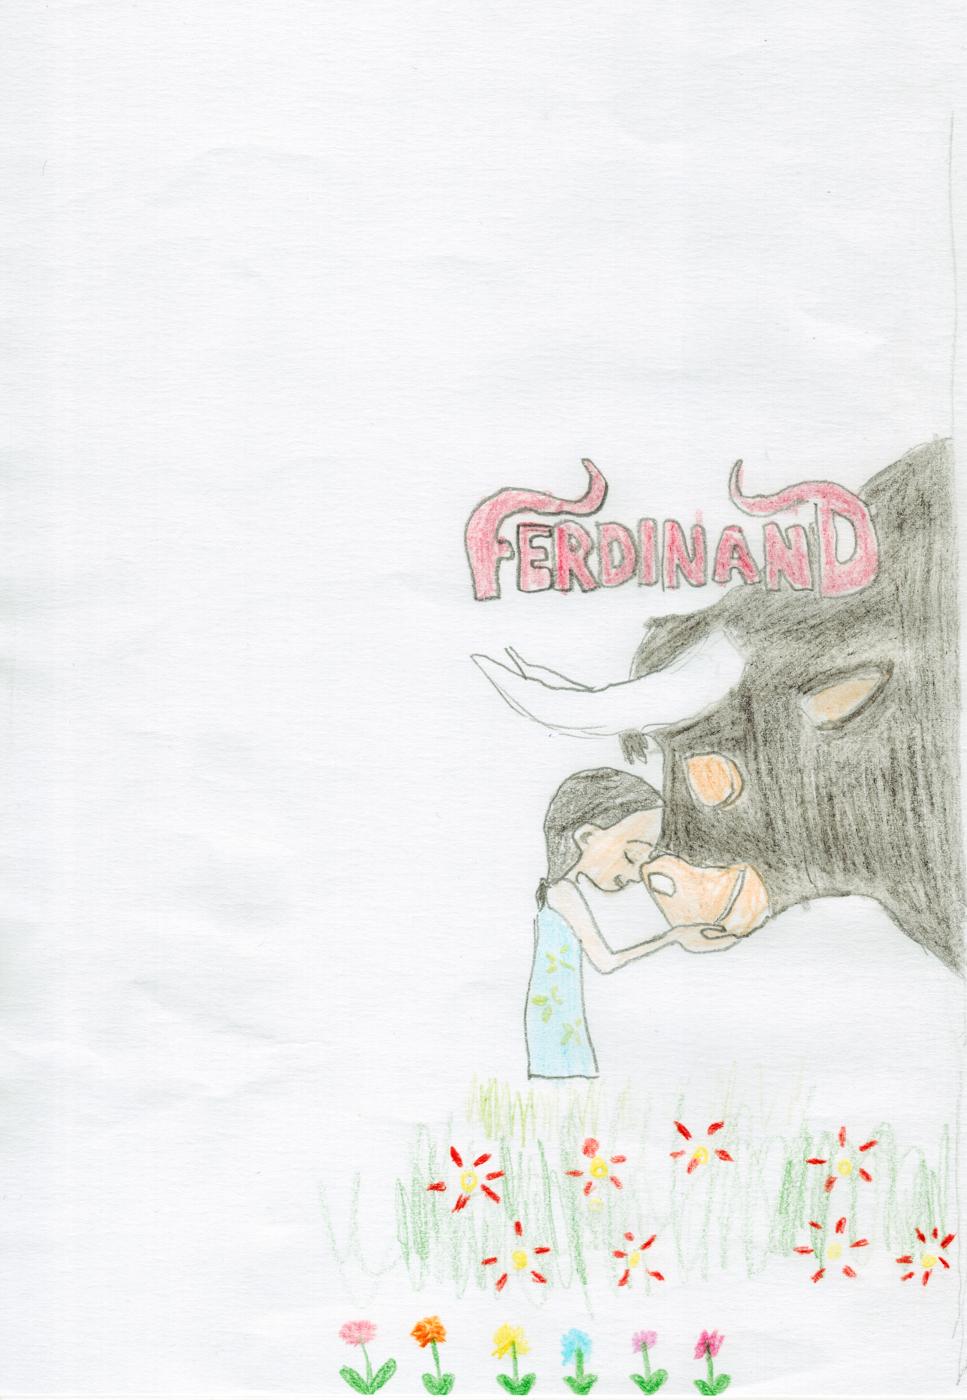 ferdinand